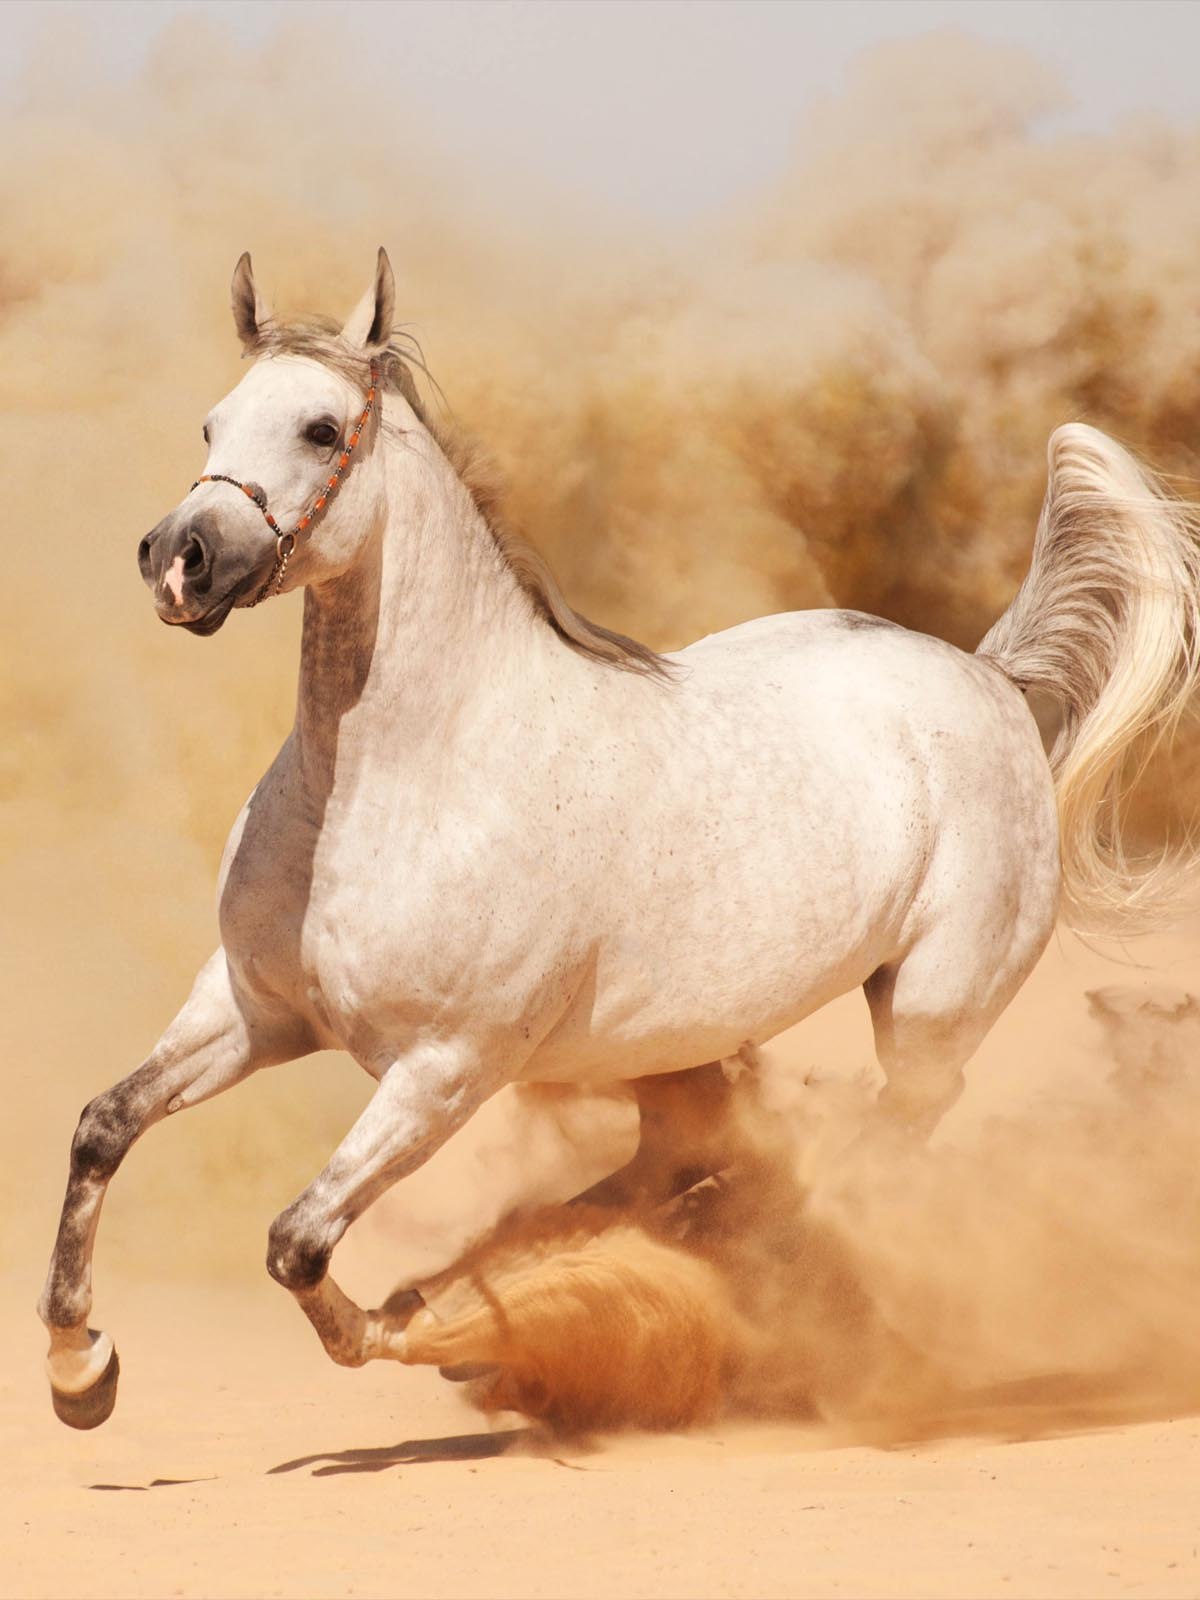 Running Horse Wallpaper Hd For Mobile 1200x1600 Wallpaper Teahub Io